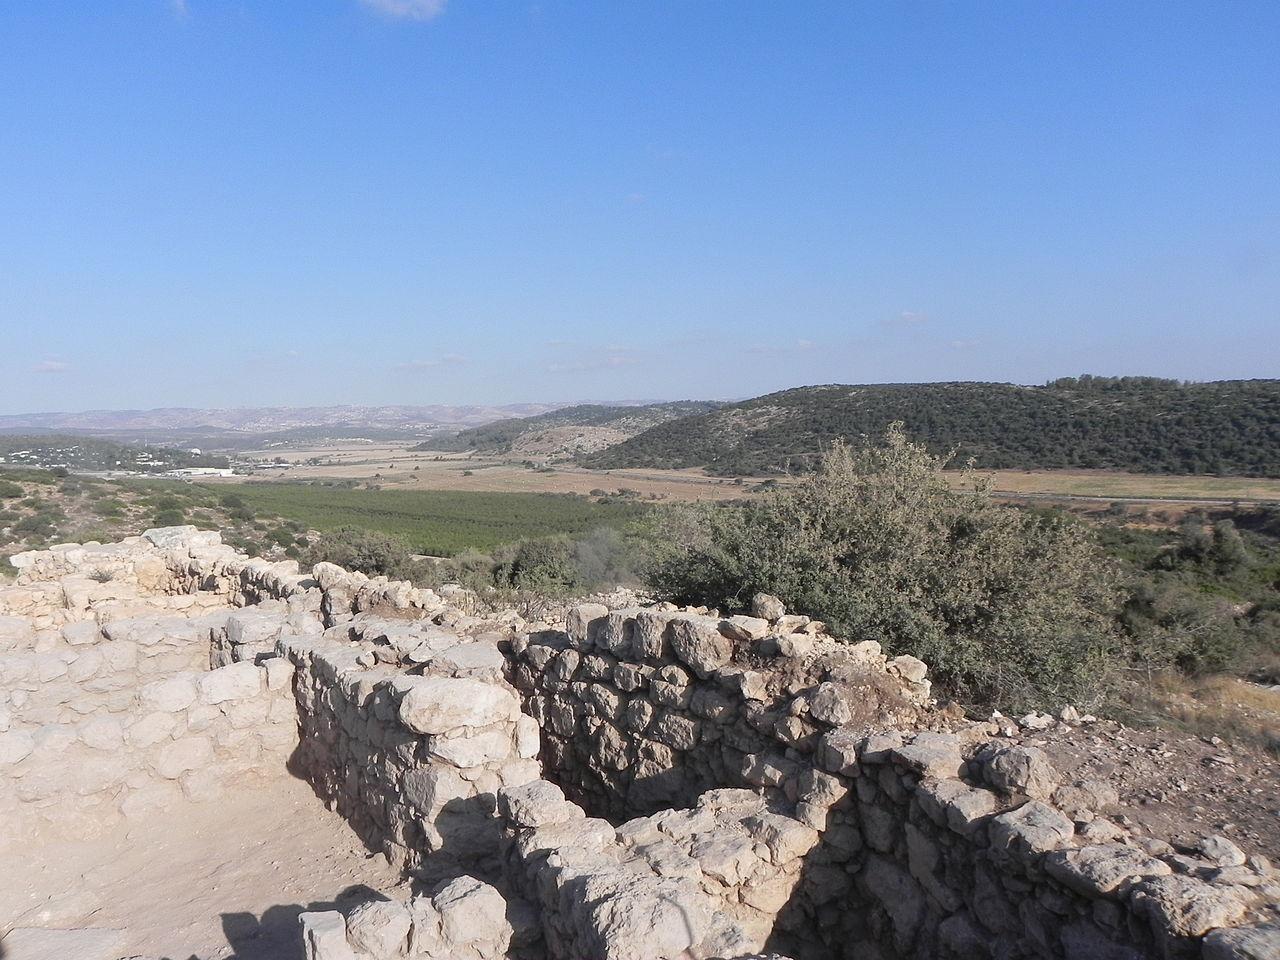 مَعرکہ اَجنادِین (موجودہ صوبہ الخلیل فلسطین) ۔ امیج نمبر 1